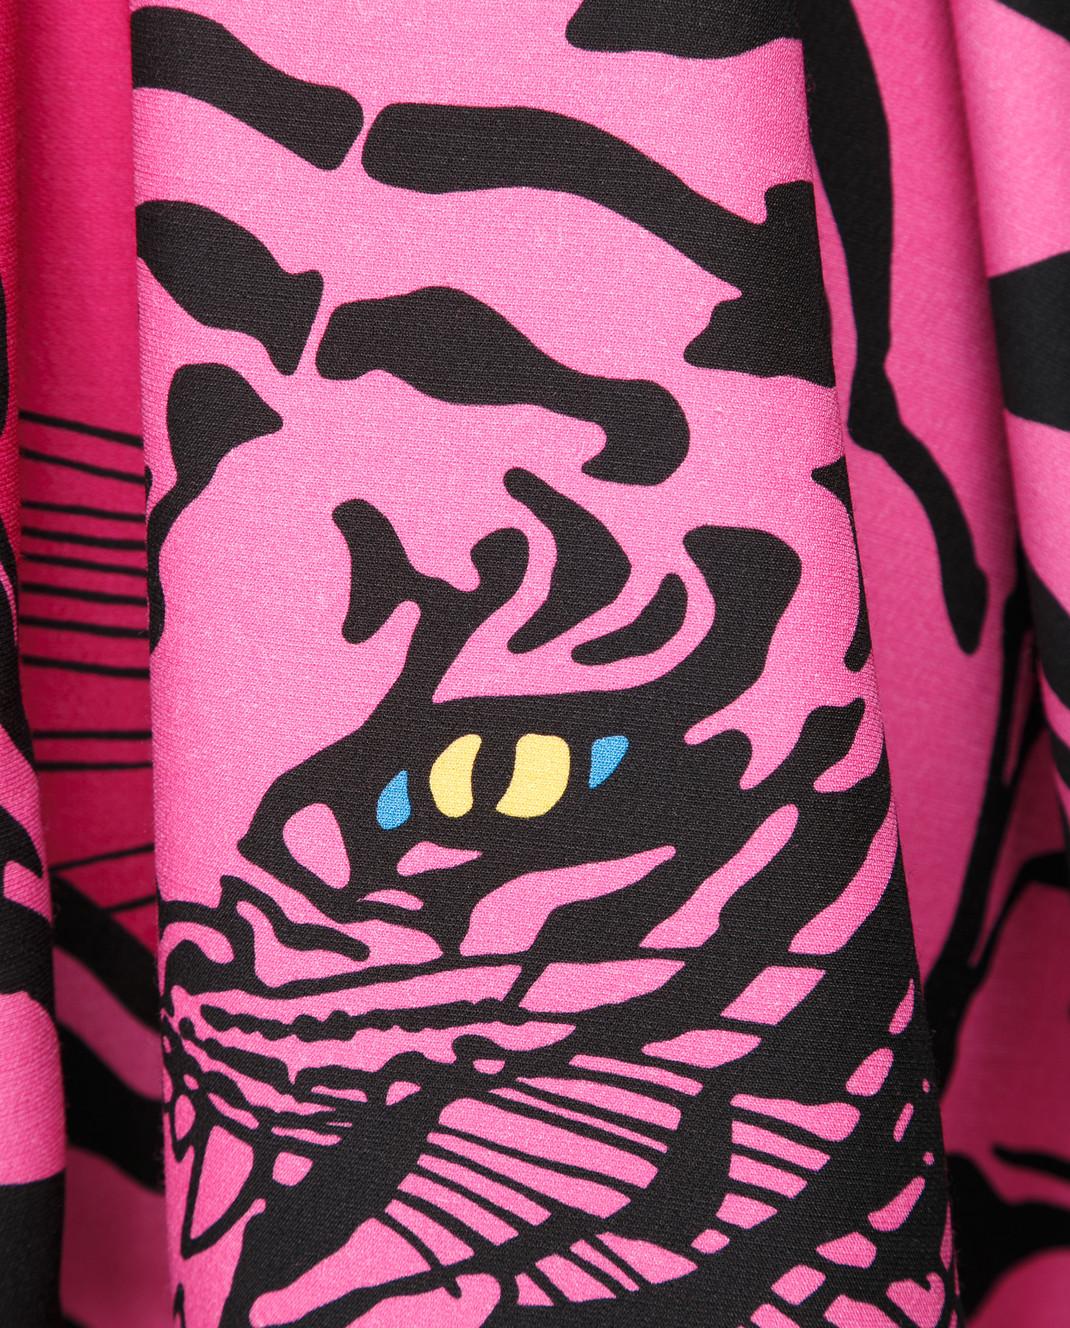 Valentino Розовая юбка из шерсти и шелка QB3RA3W546B изображение 5